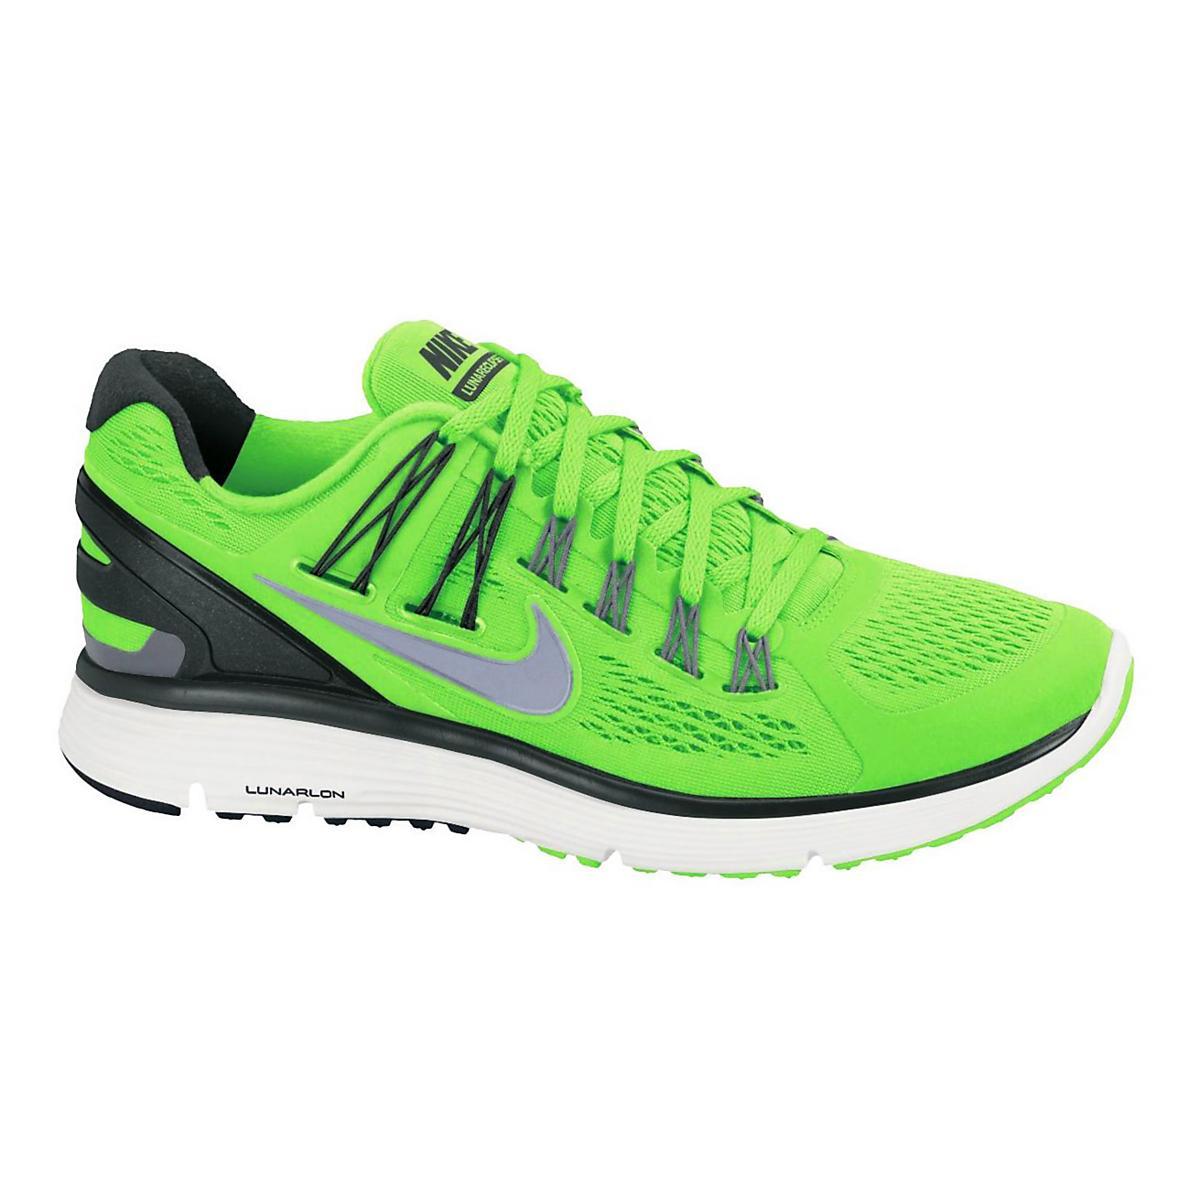 bb1ed965fdfe1 ... Mens Nike LunarEclipse+ 3 Running Shoe at Road Runner Sports ...